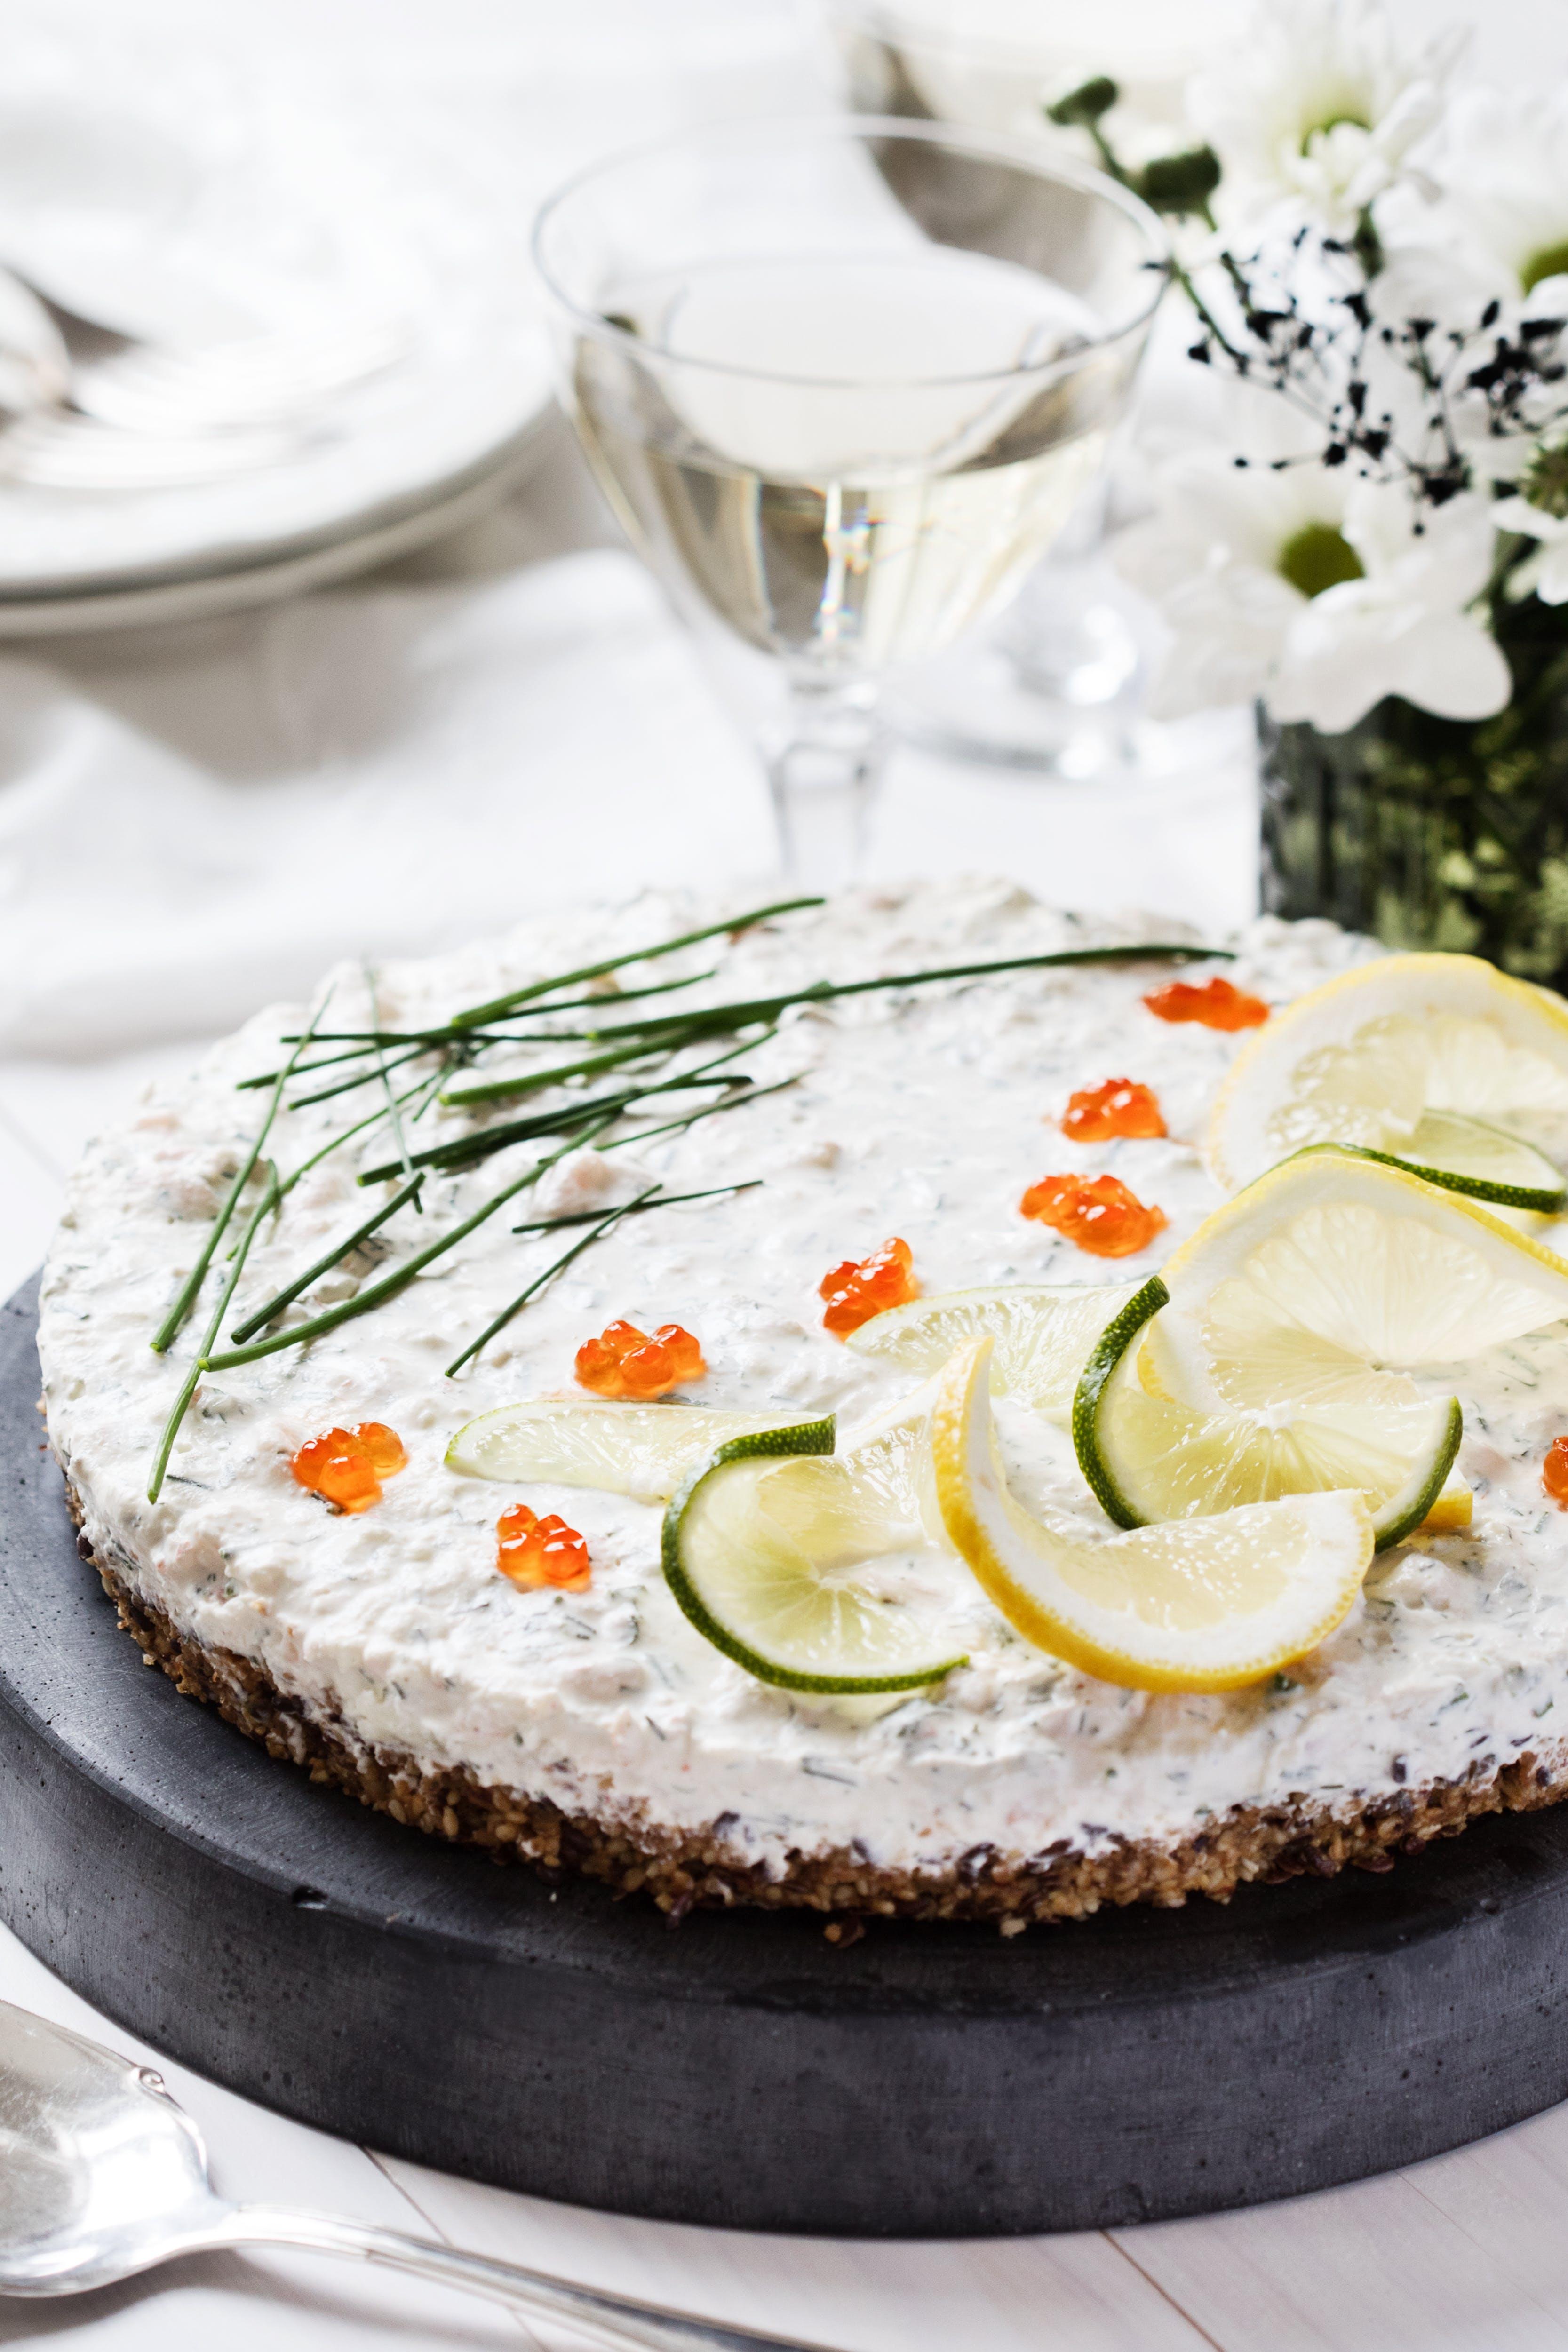 Low-carb shrimp cheesecake